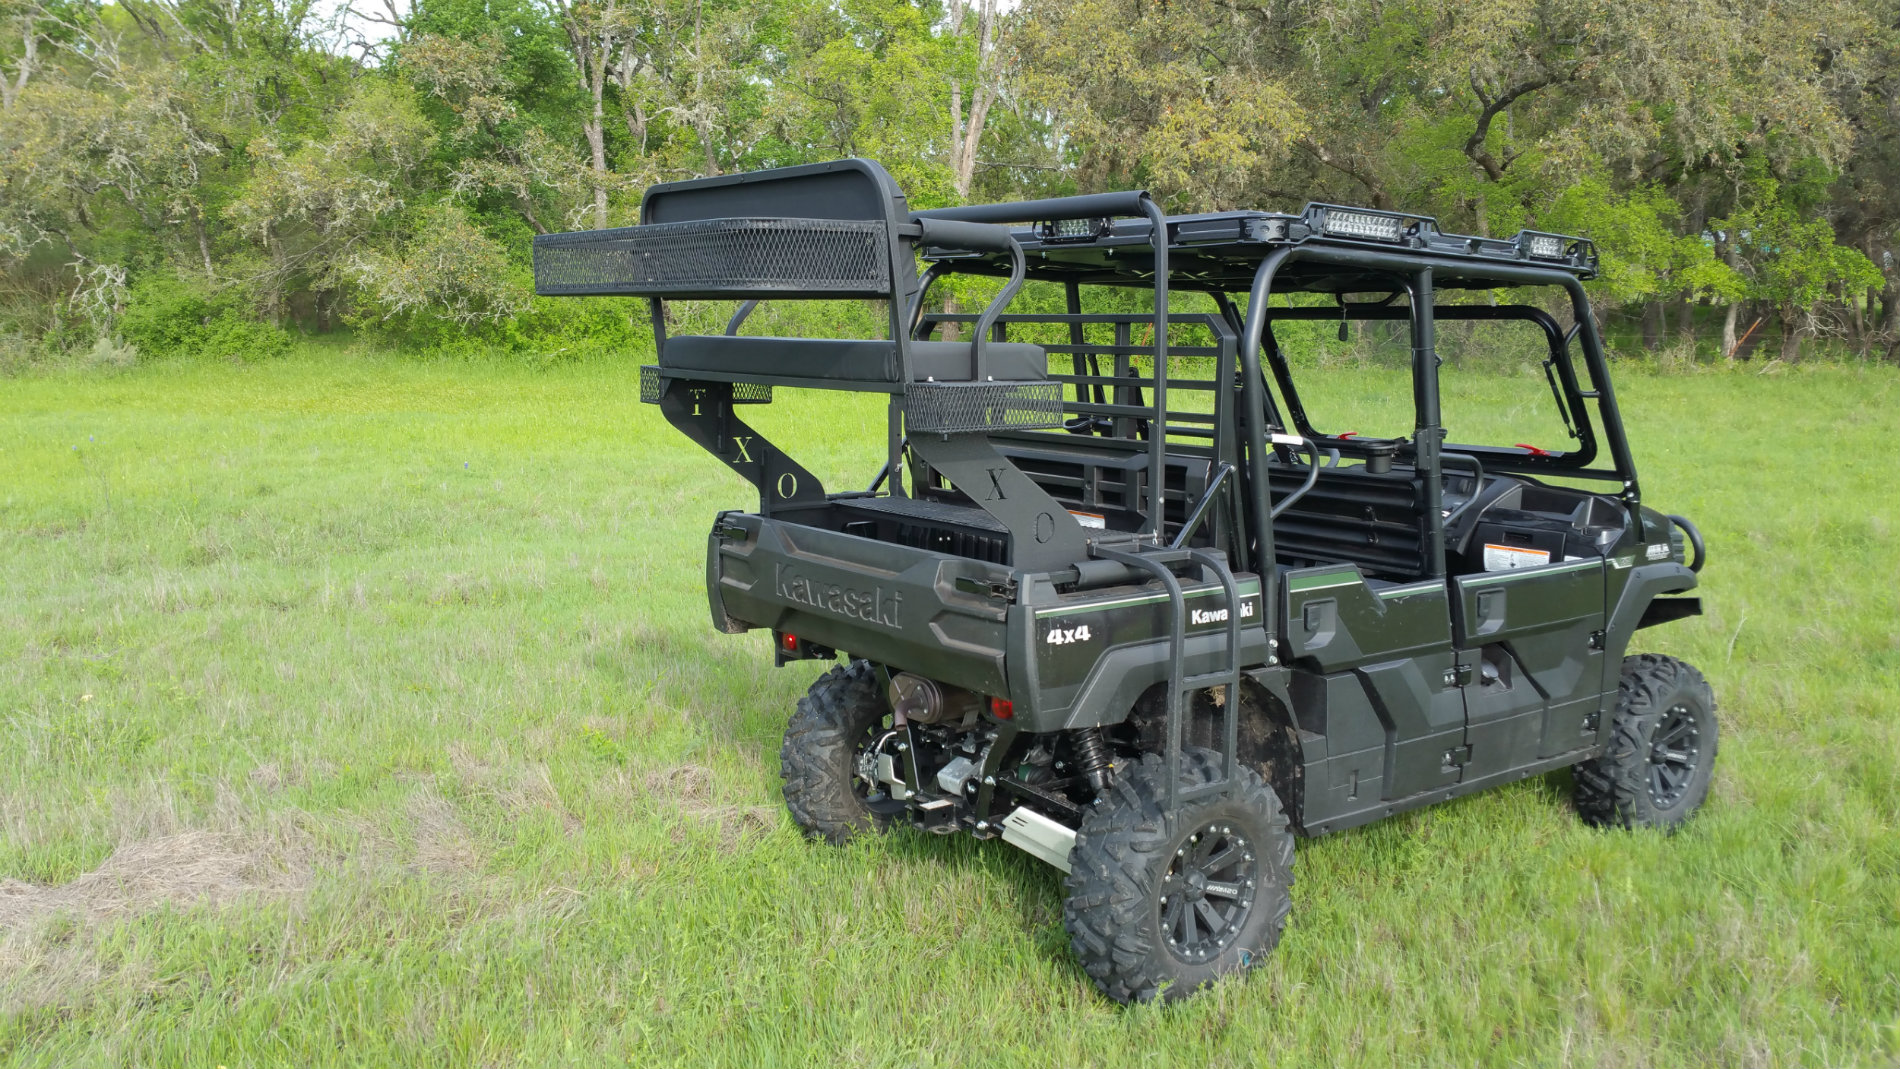 Kawasaki Mule Pro Fxt High Seat Texas Outdoors